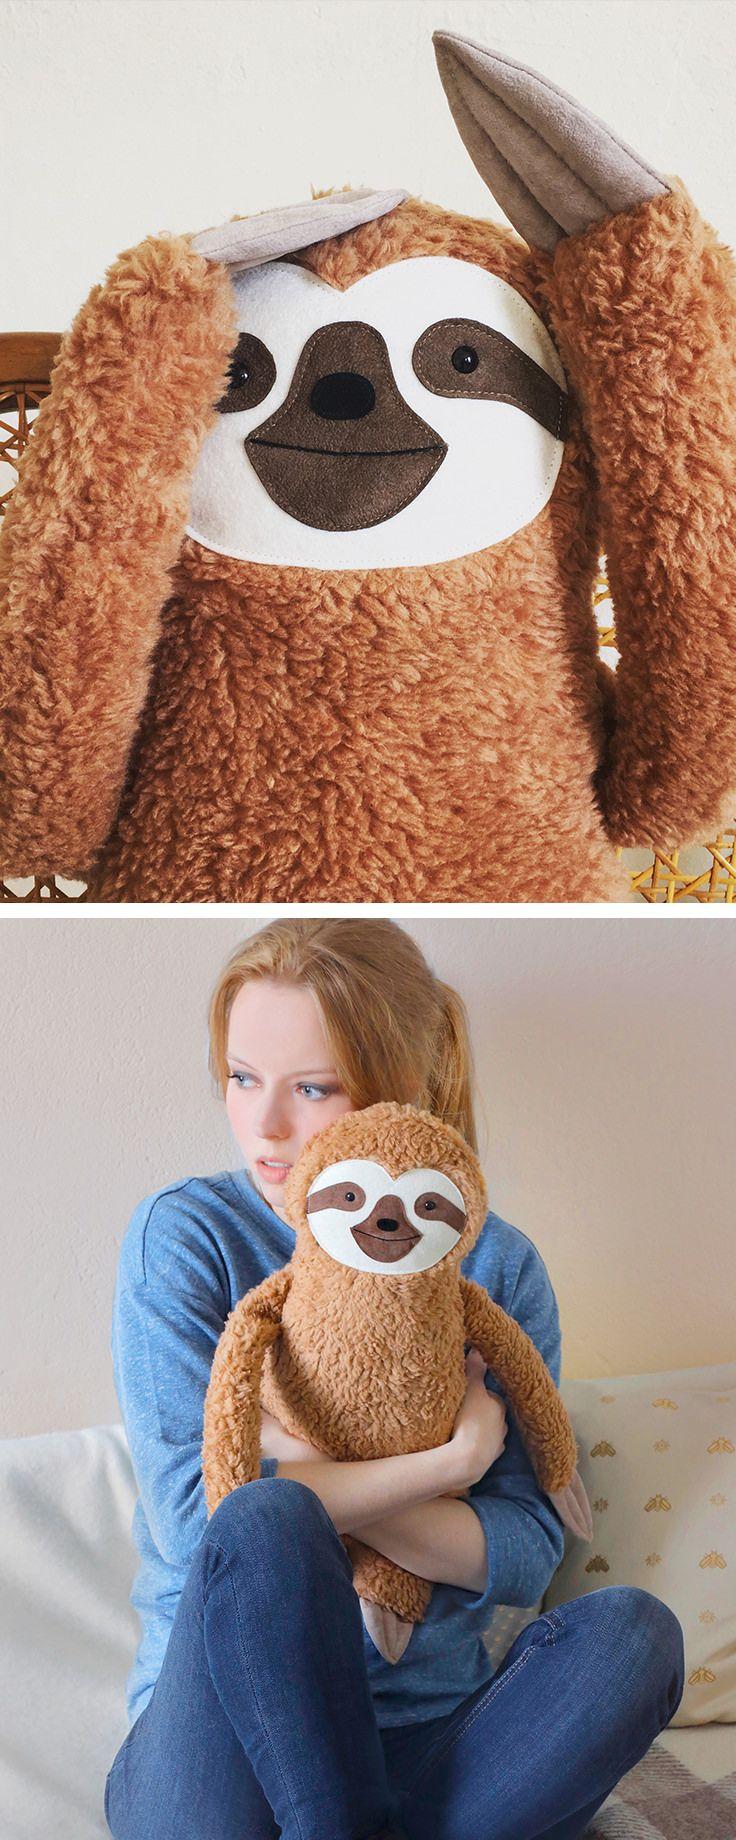 Kuscheliger Begleiter und #geschenkidee für Weihnachten: Großes #Faultier Kuscheltier / cute #sloth soft toy as #giftidea for christmas made by Petite Panda via DaWanda.com